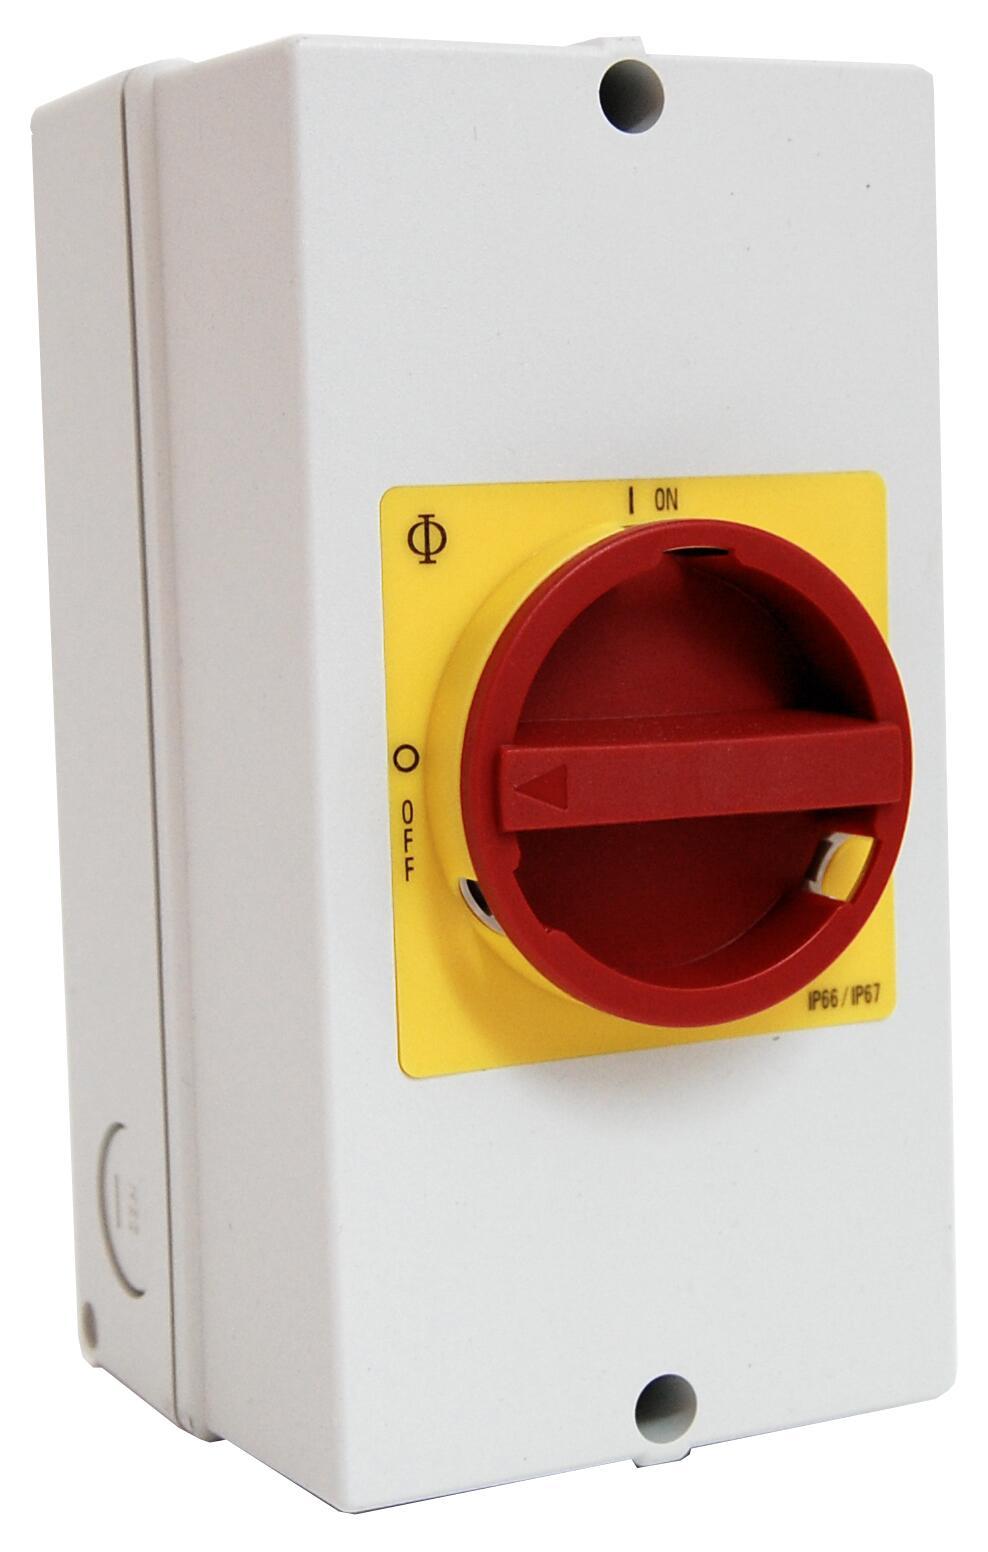 1 Stk Not-Aus-Schalter, 3-polig + 2 Hilfskontakte, PE-Klemme, 32A IN892012--